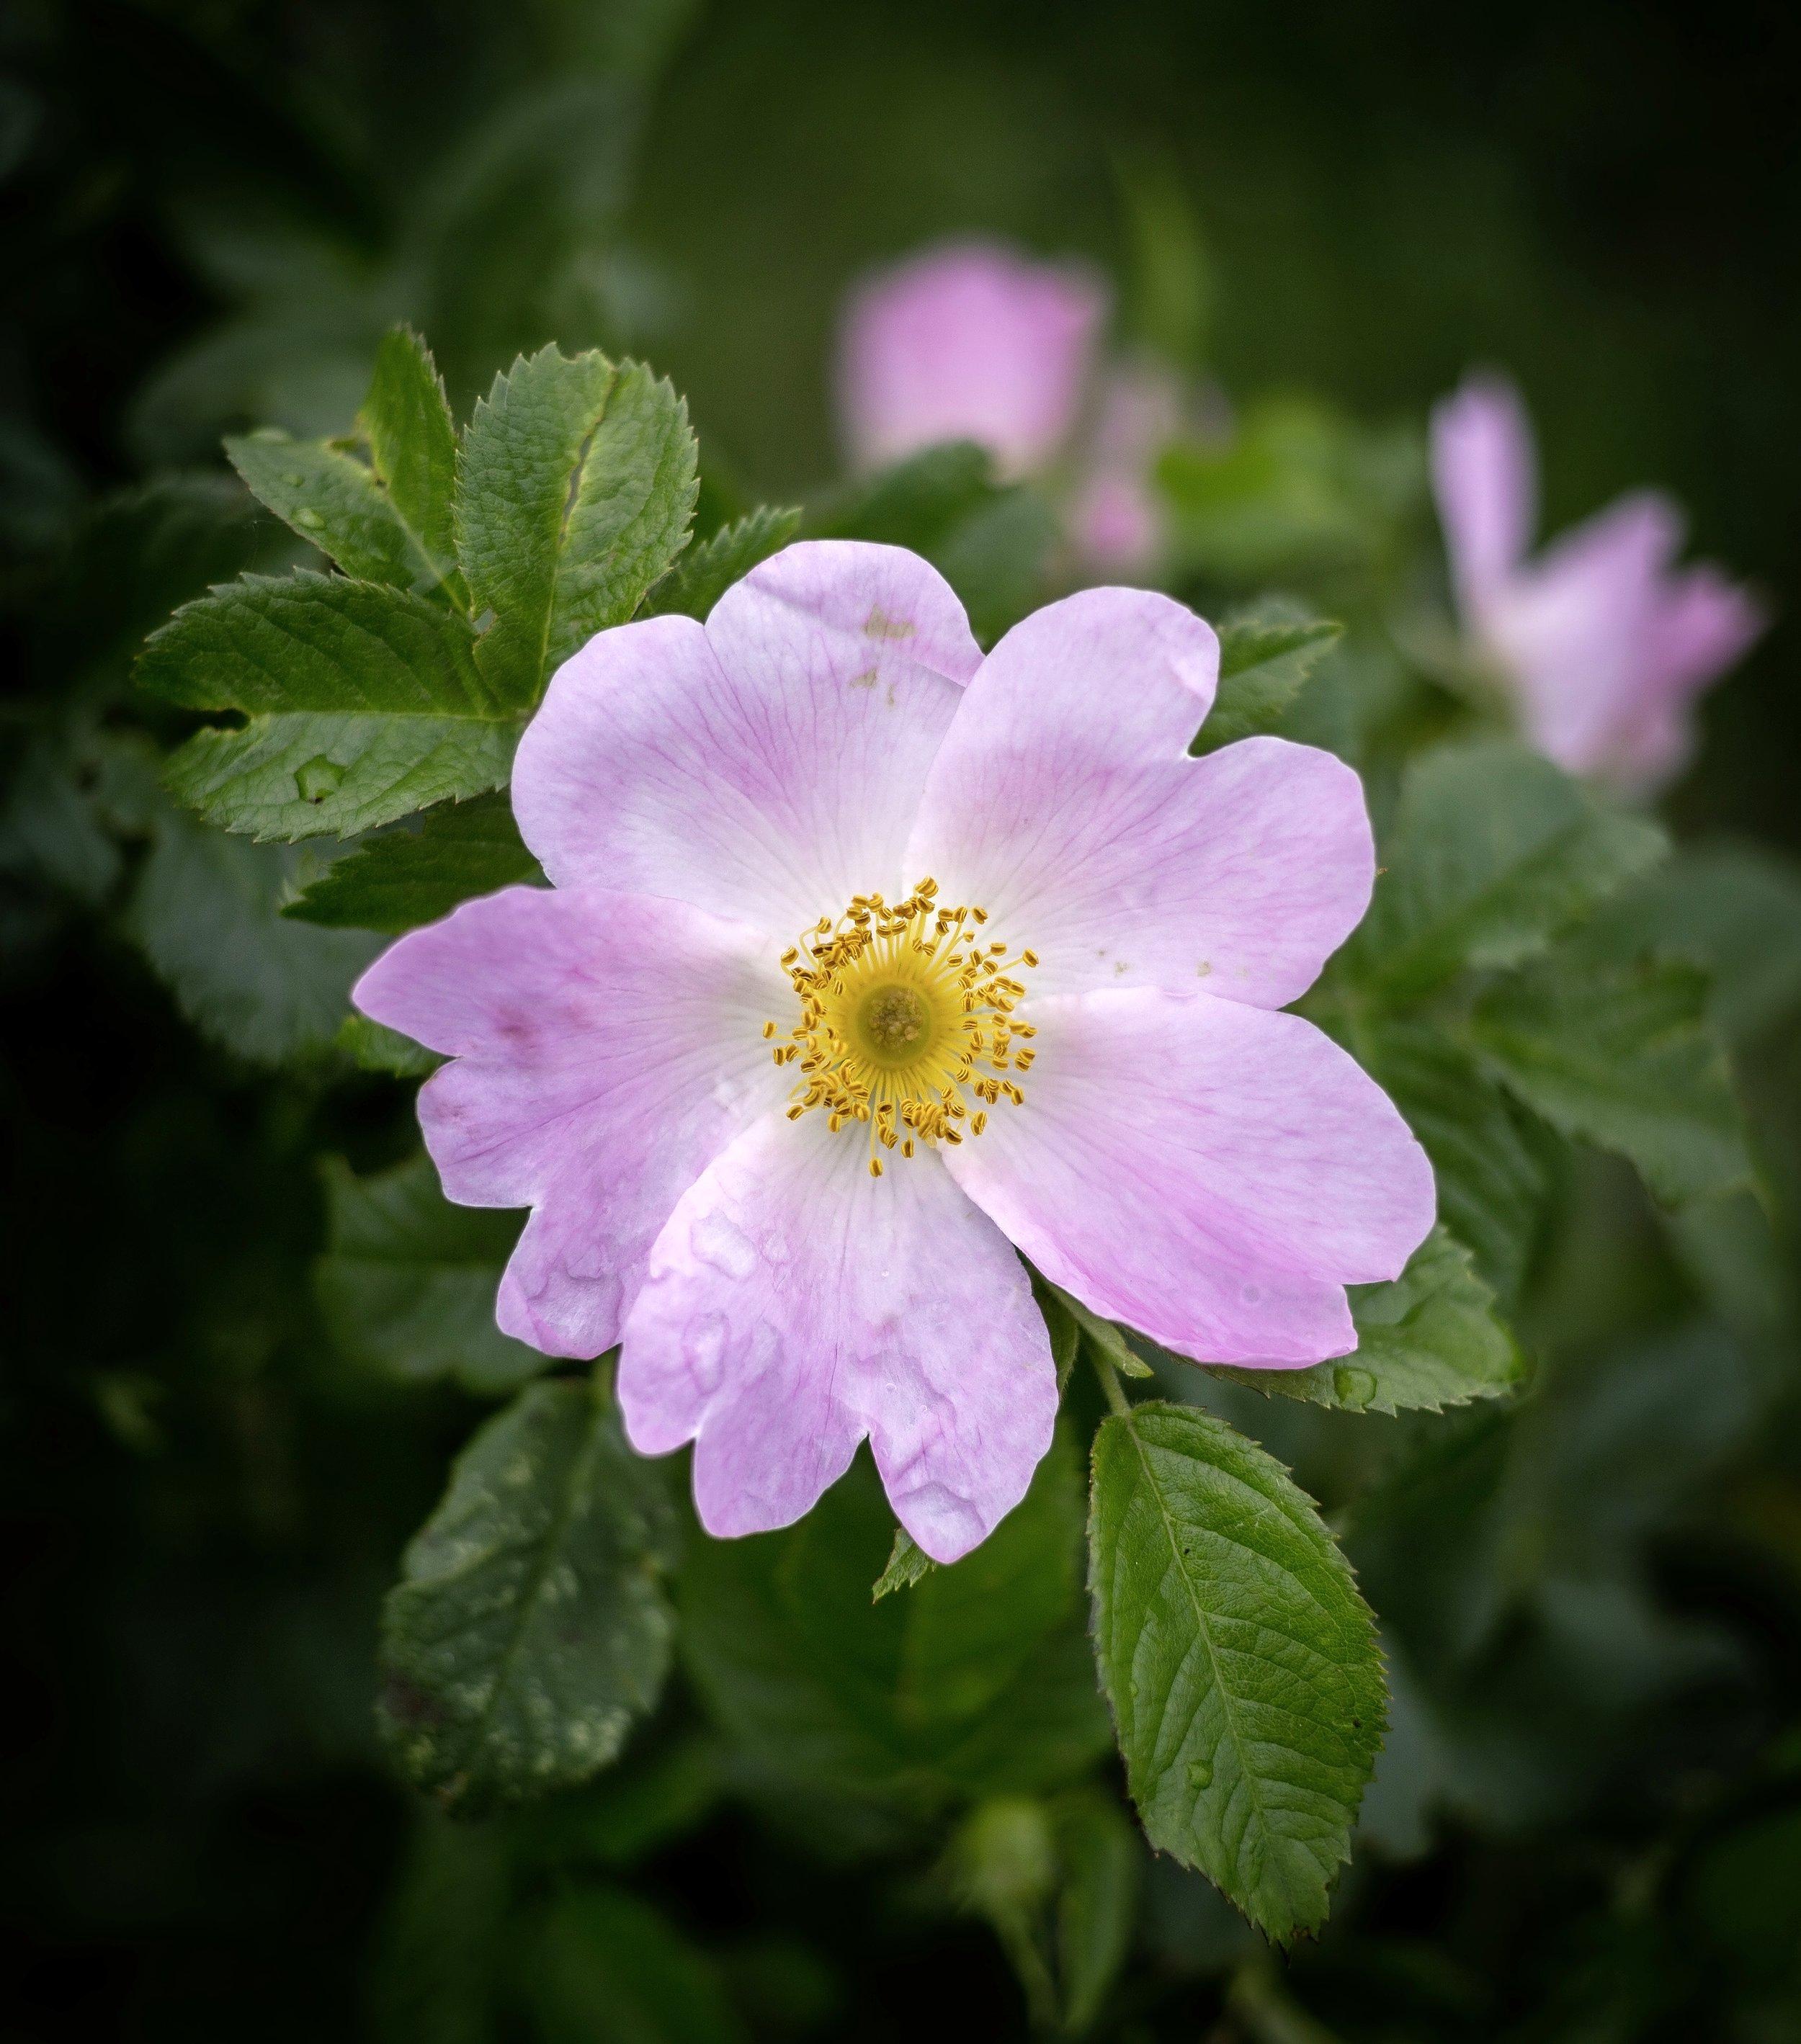 Plant a dog rose